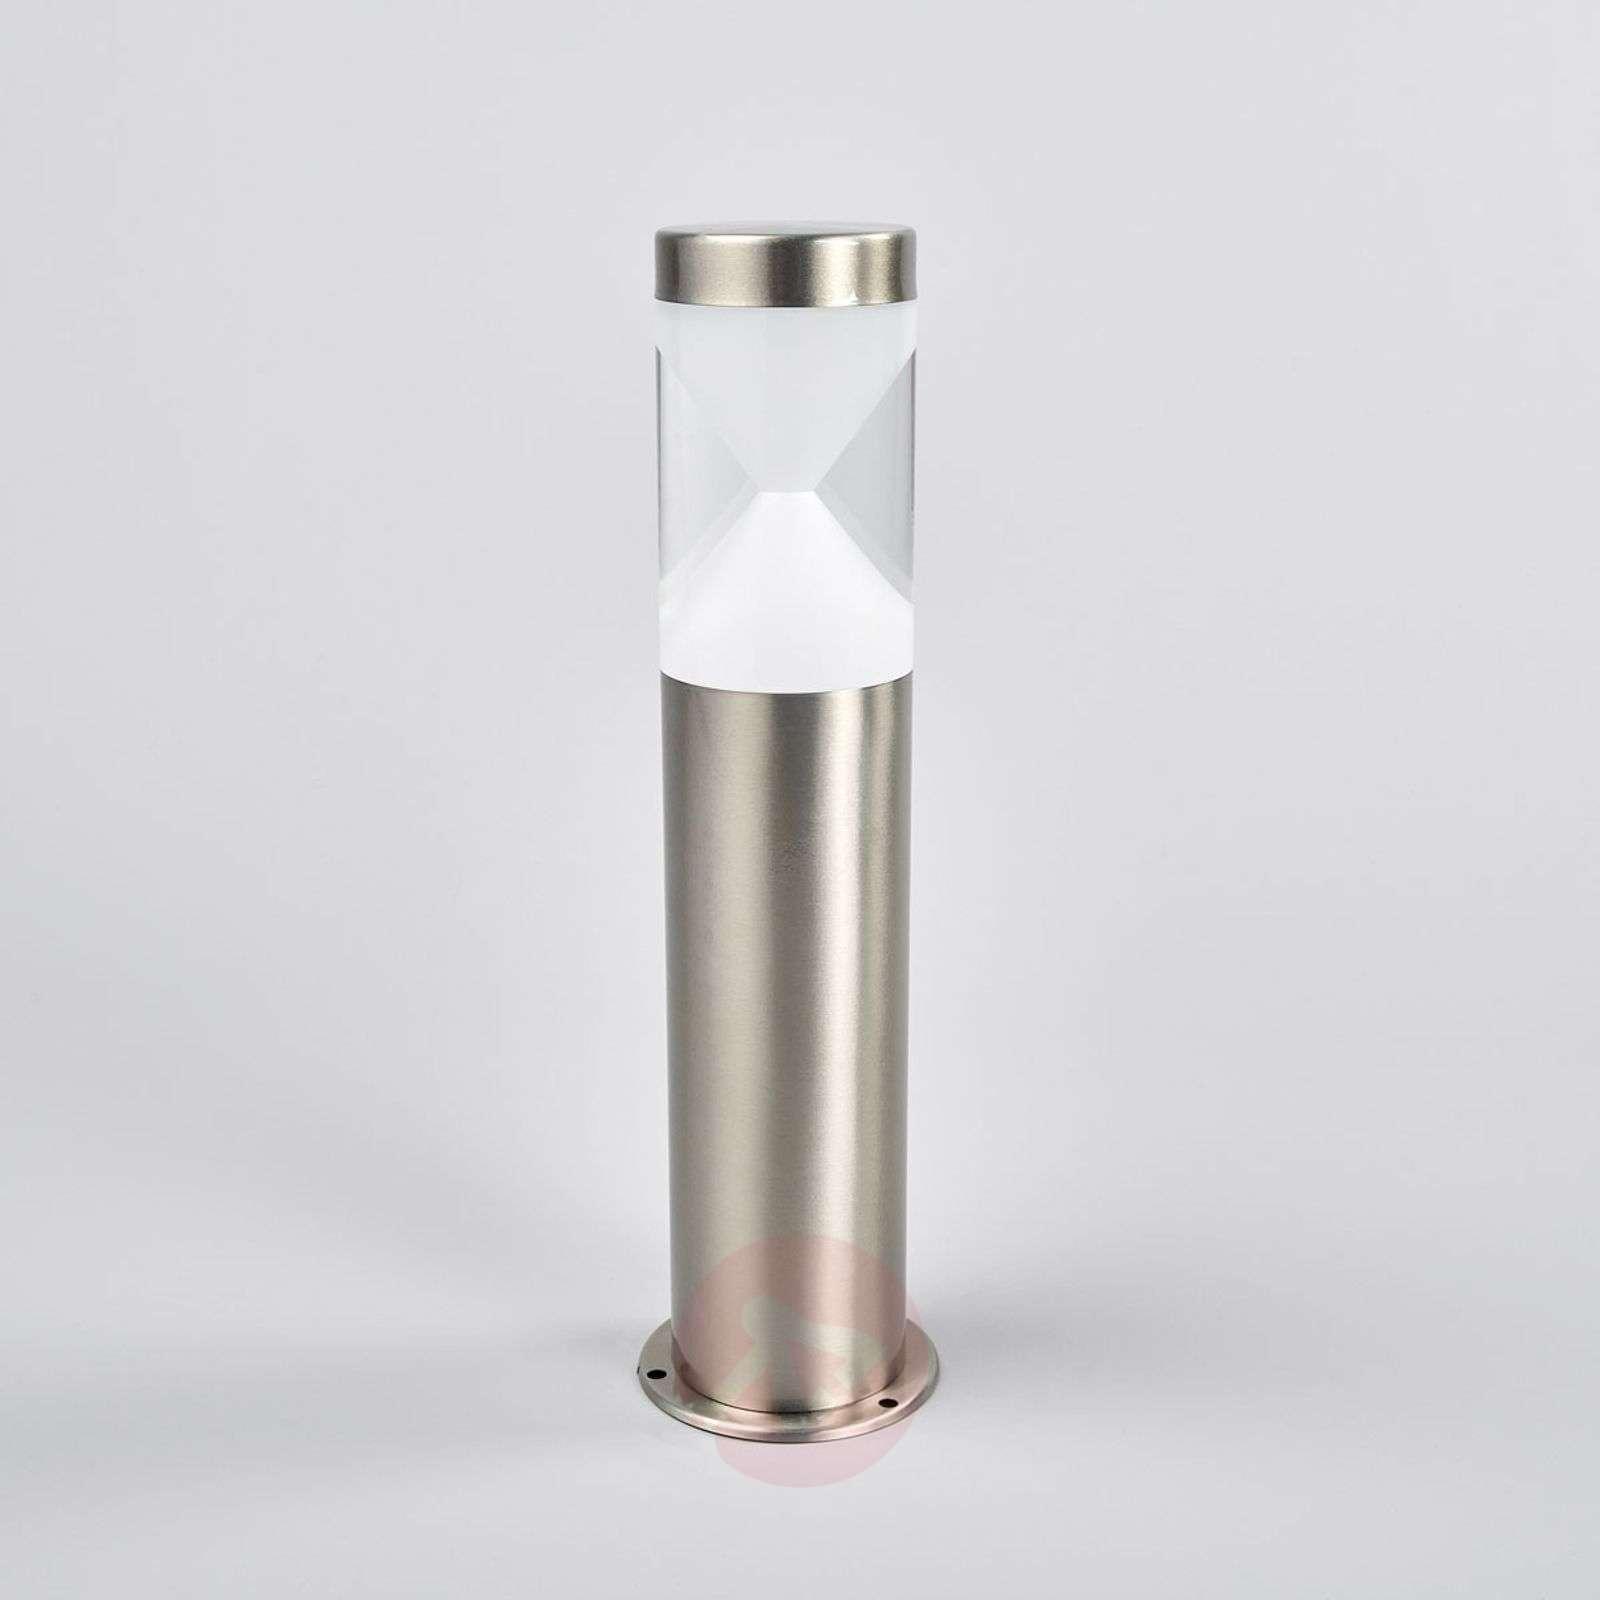 Fabrizio LED pillar lamp with hourglass look-9988153-01